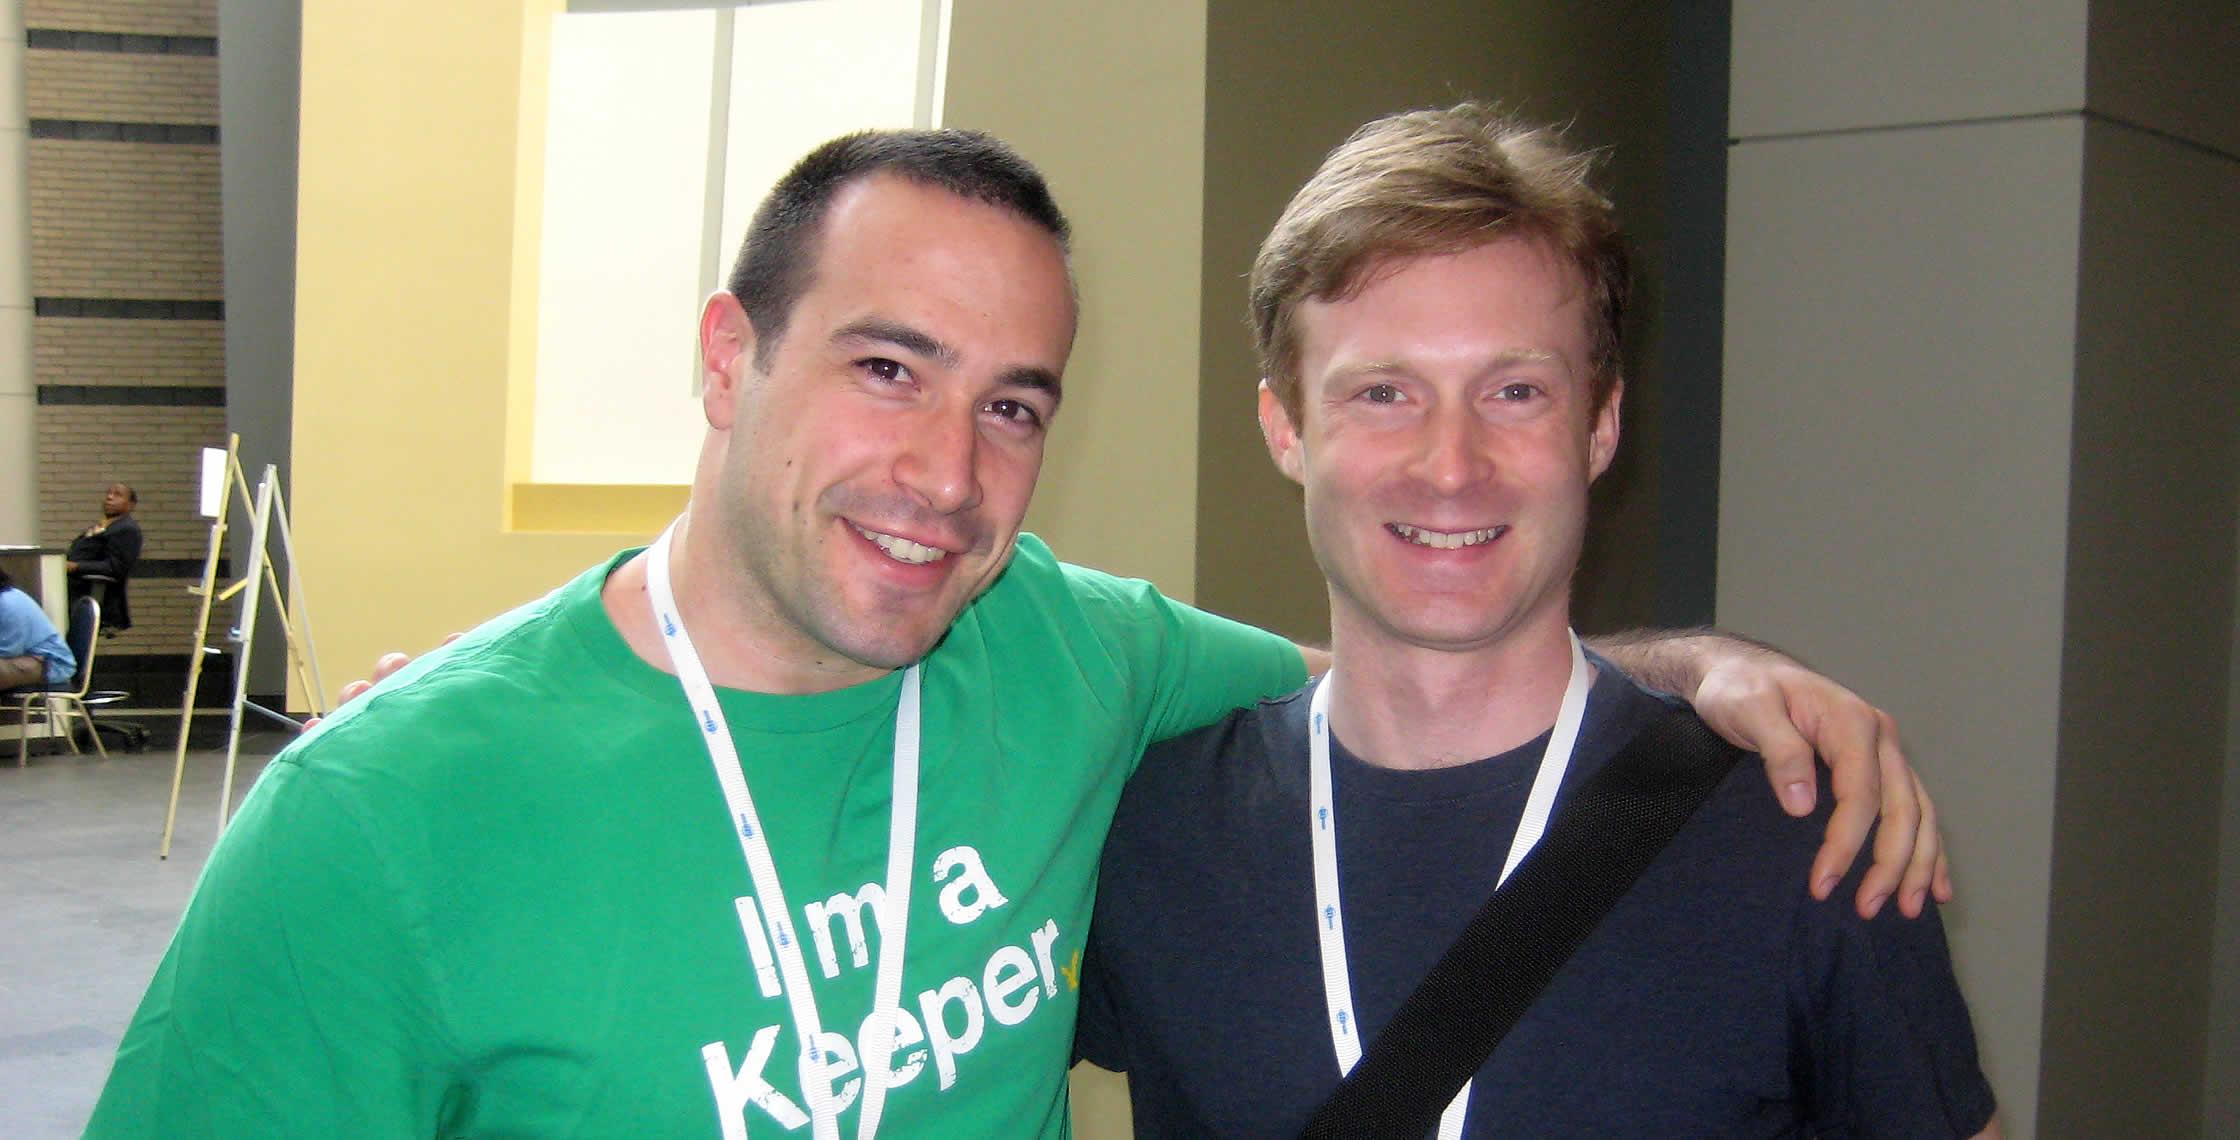 Ben Nadel at CFUNITED 2008 (Washington, D.C.) with: Sam Farmer